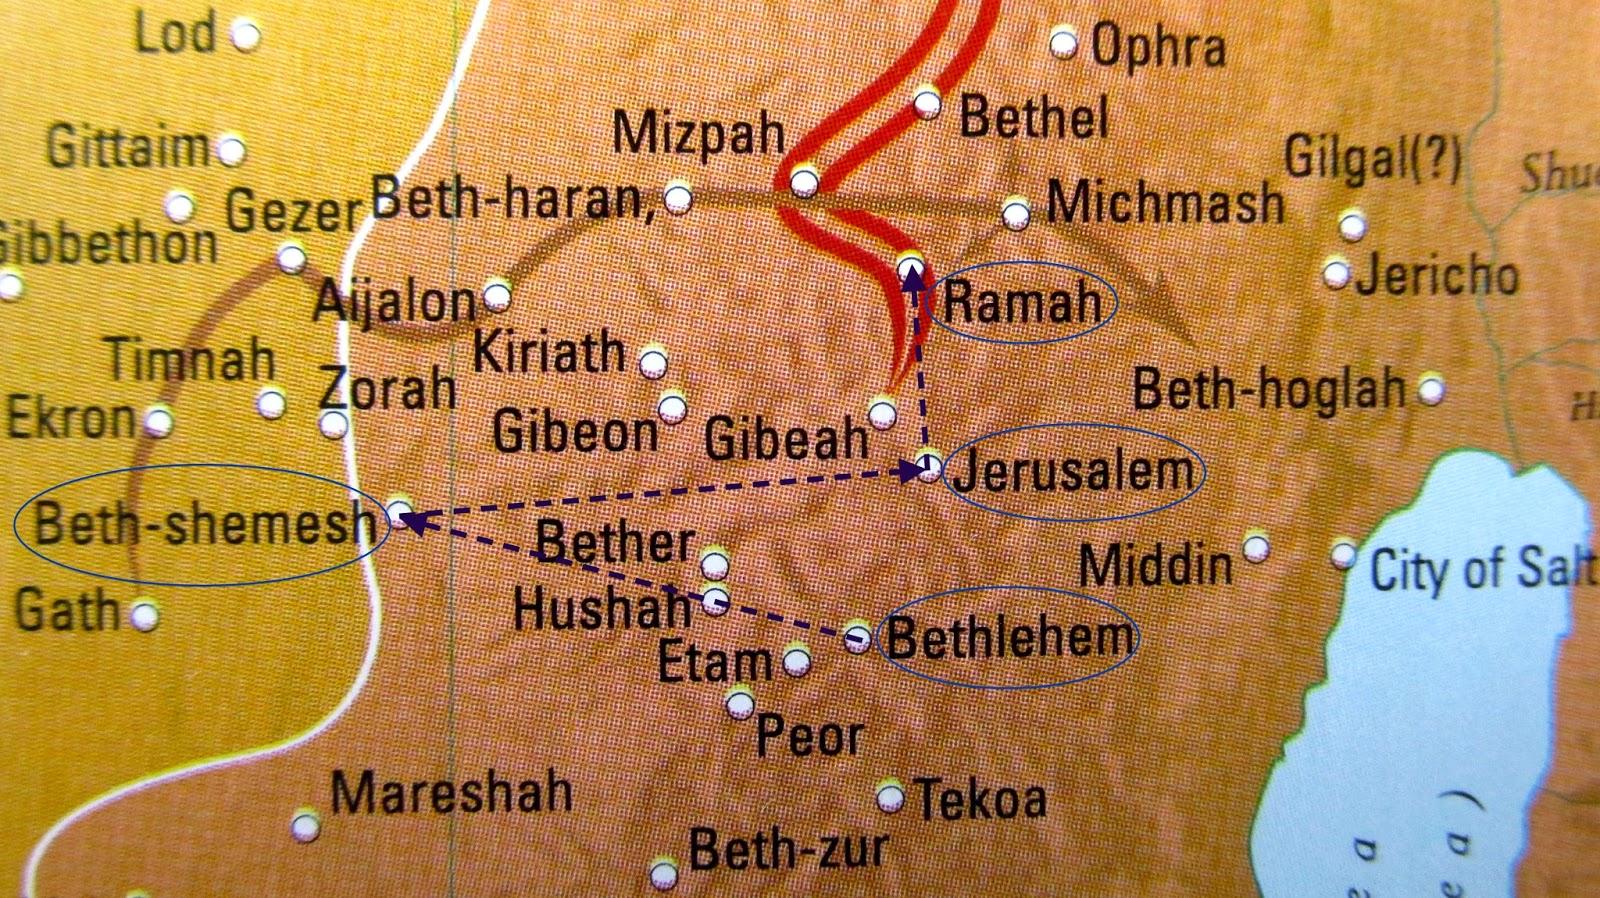 Beth Shemesh Bible Maps: Roma, The Eternal City Is Rama, The Universal Deity